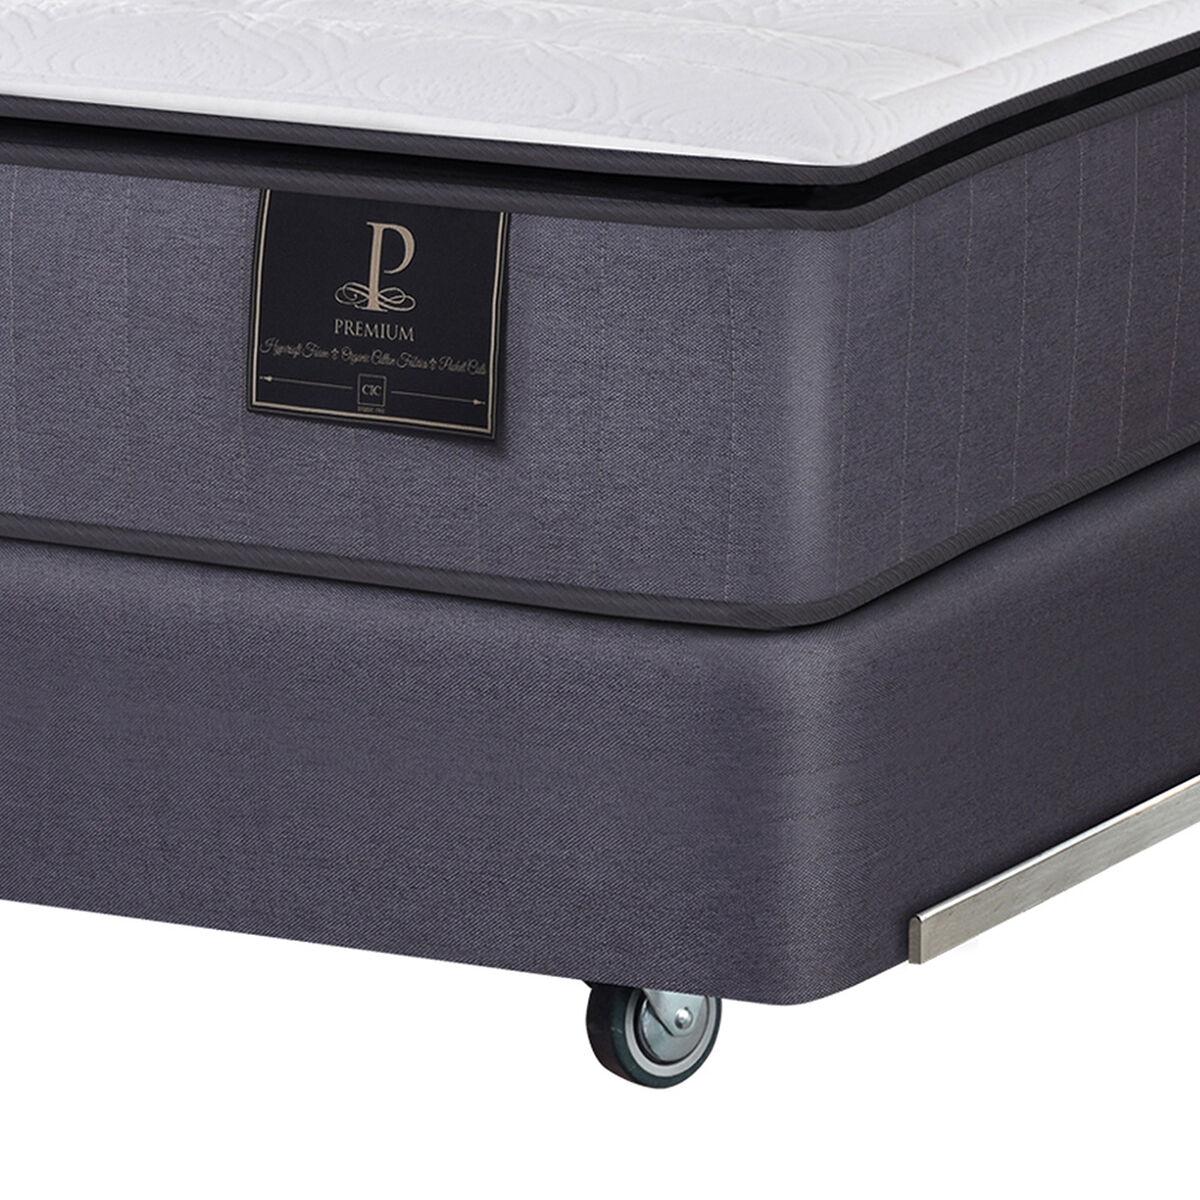 Box Spring CIC Base Dividida King Premium + Set Textiles + Almohadas